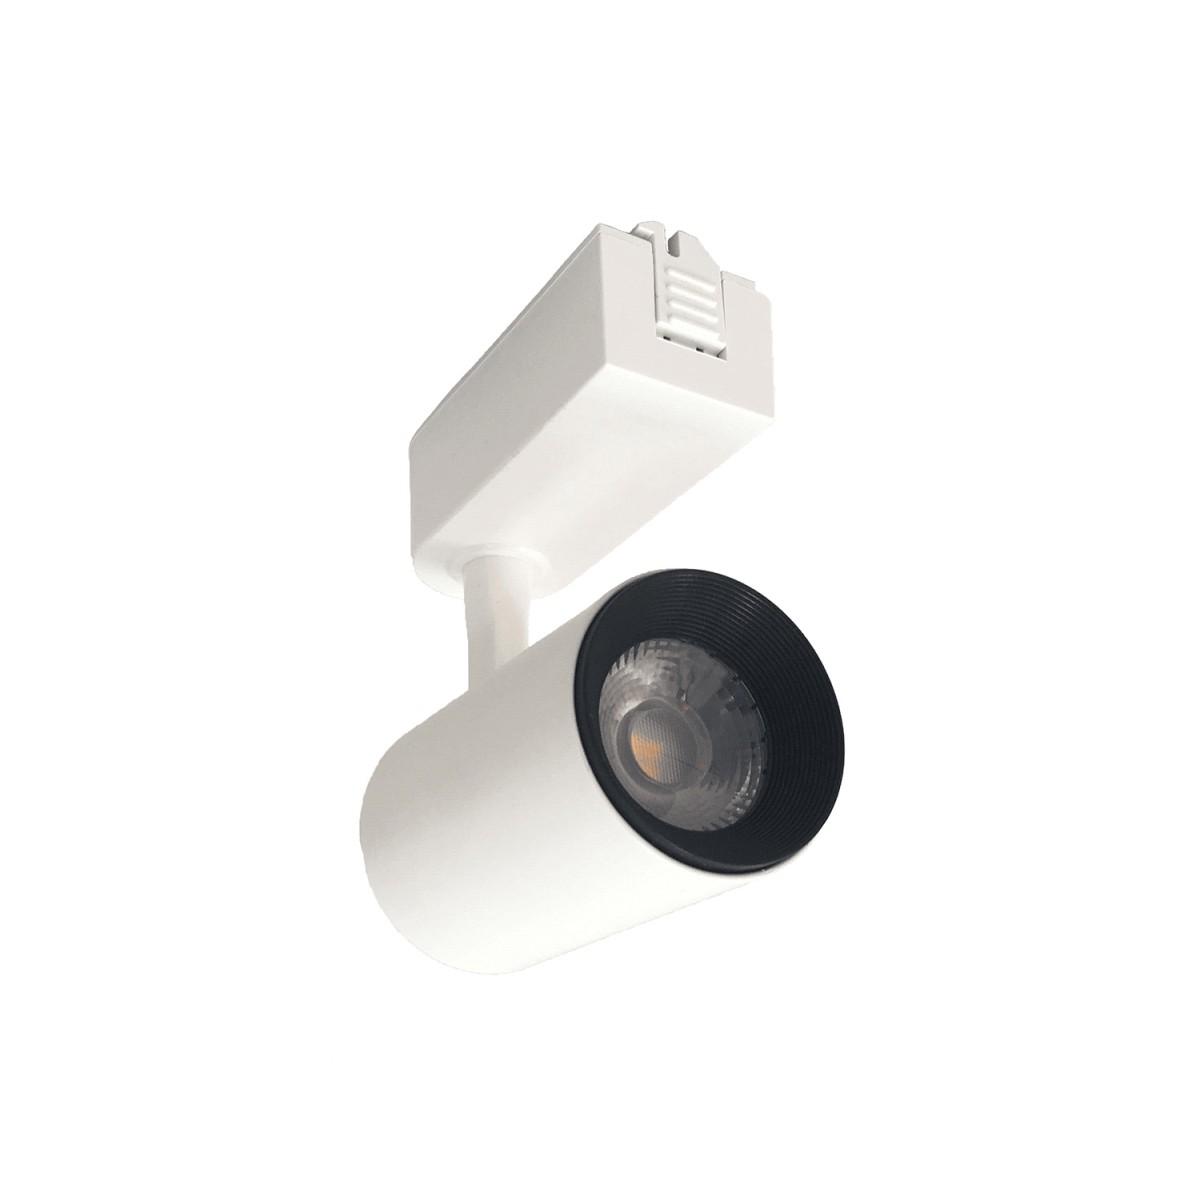 Spot Para Trilho LED 7W 3000K Branco Bivolt